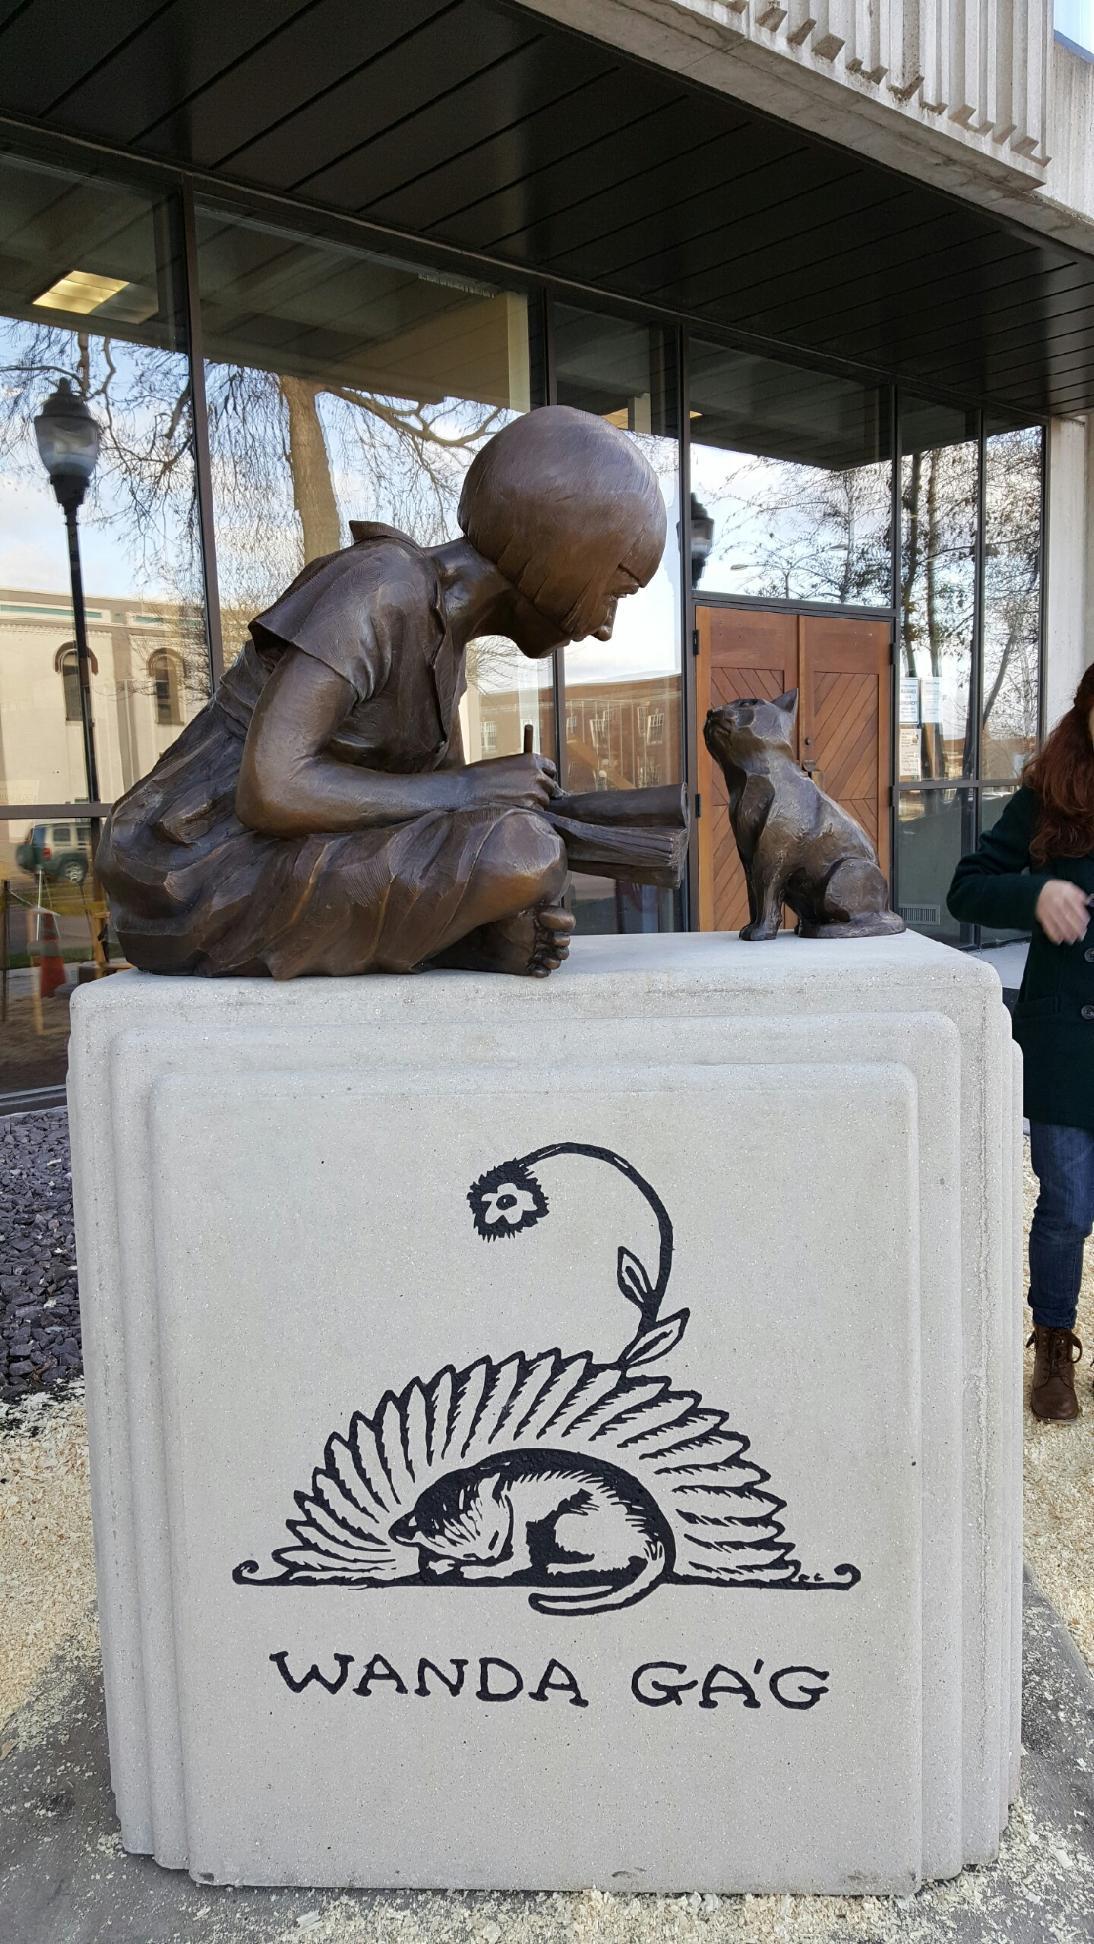 Wanda Gag Monument, New Ulm, MN, bronze and cast stone, life-sized.